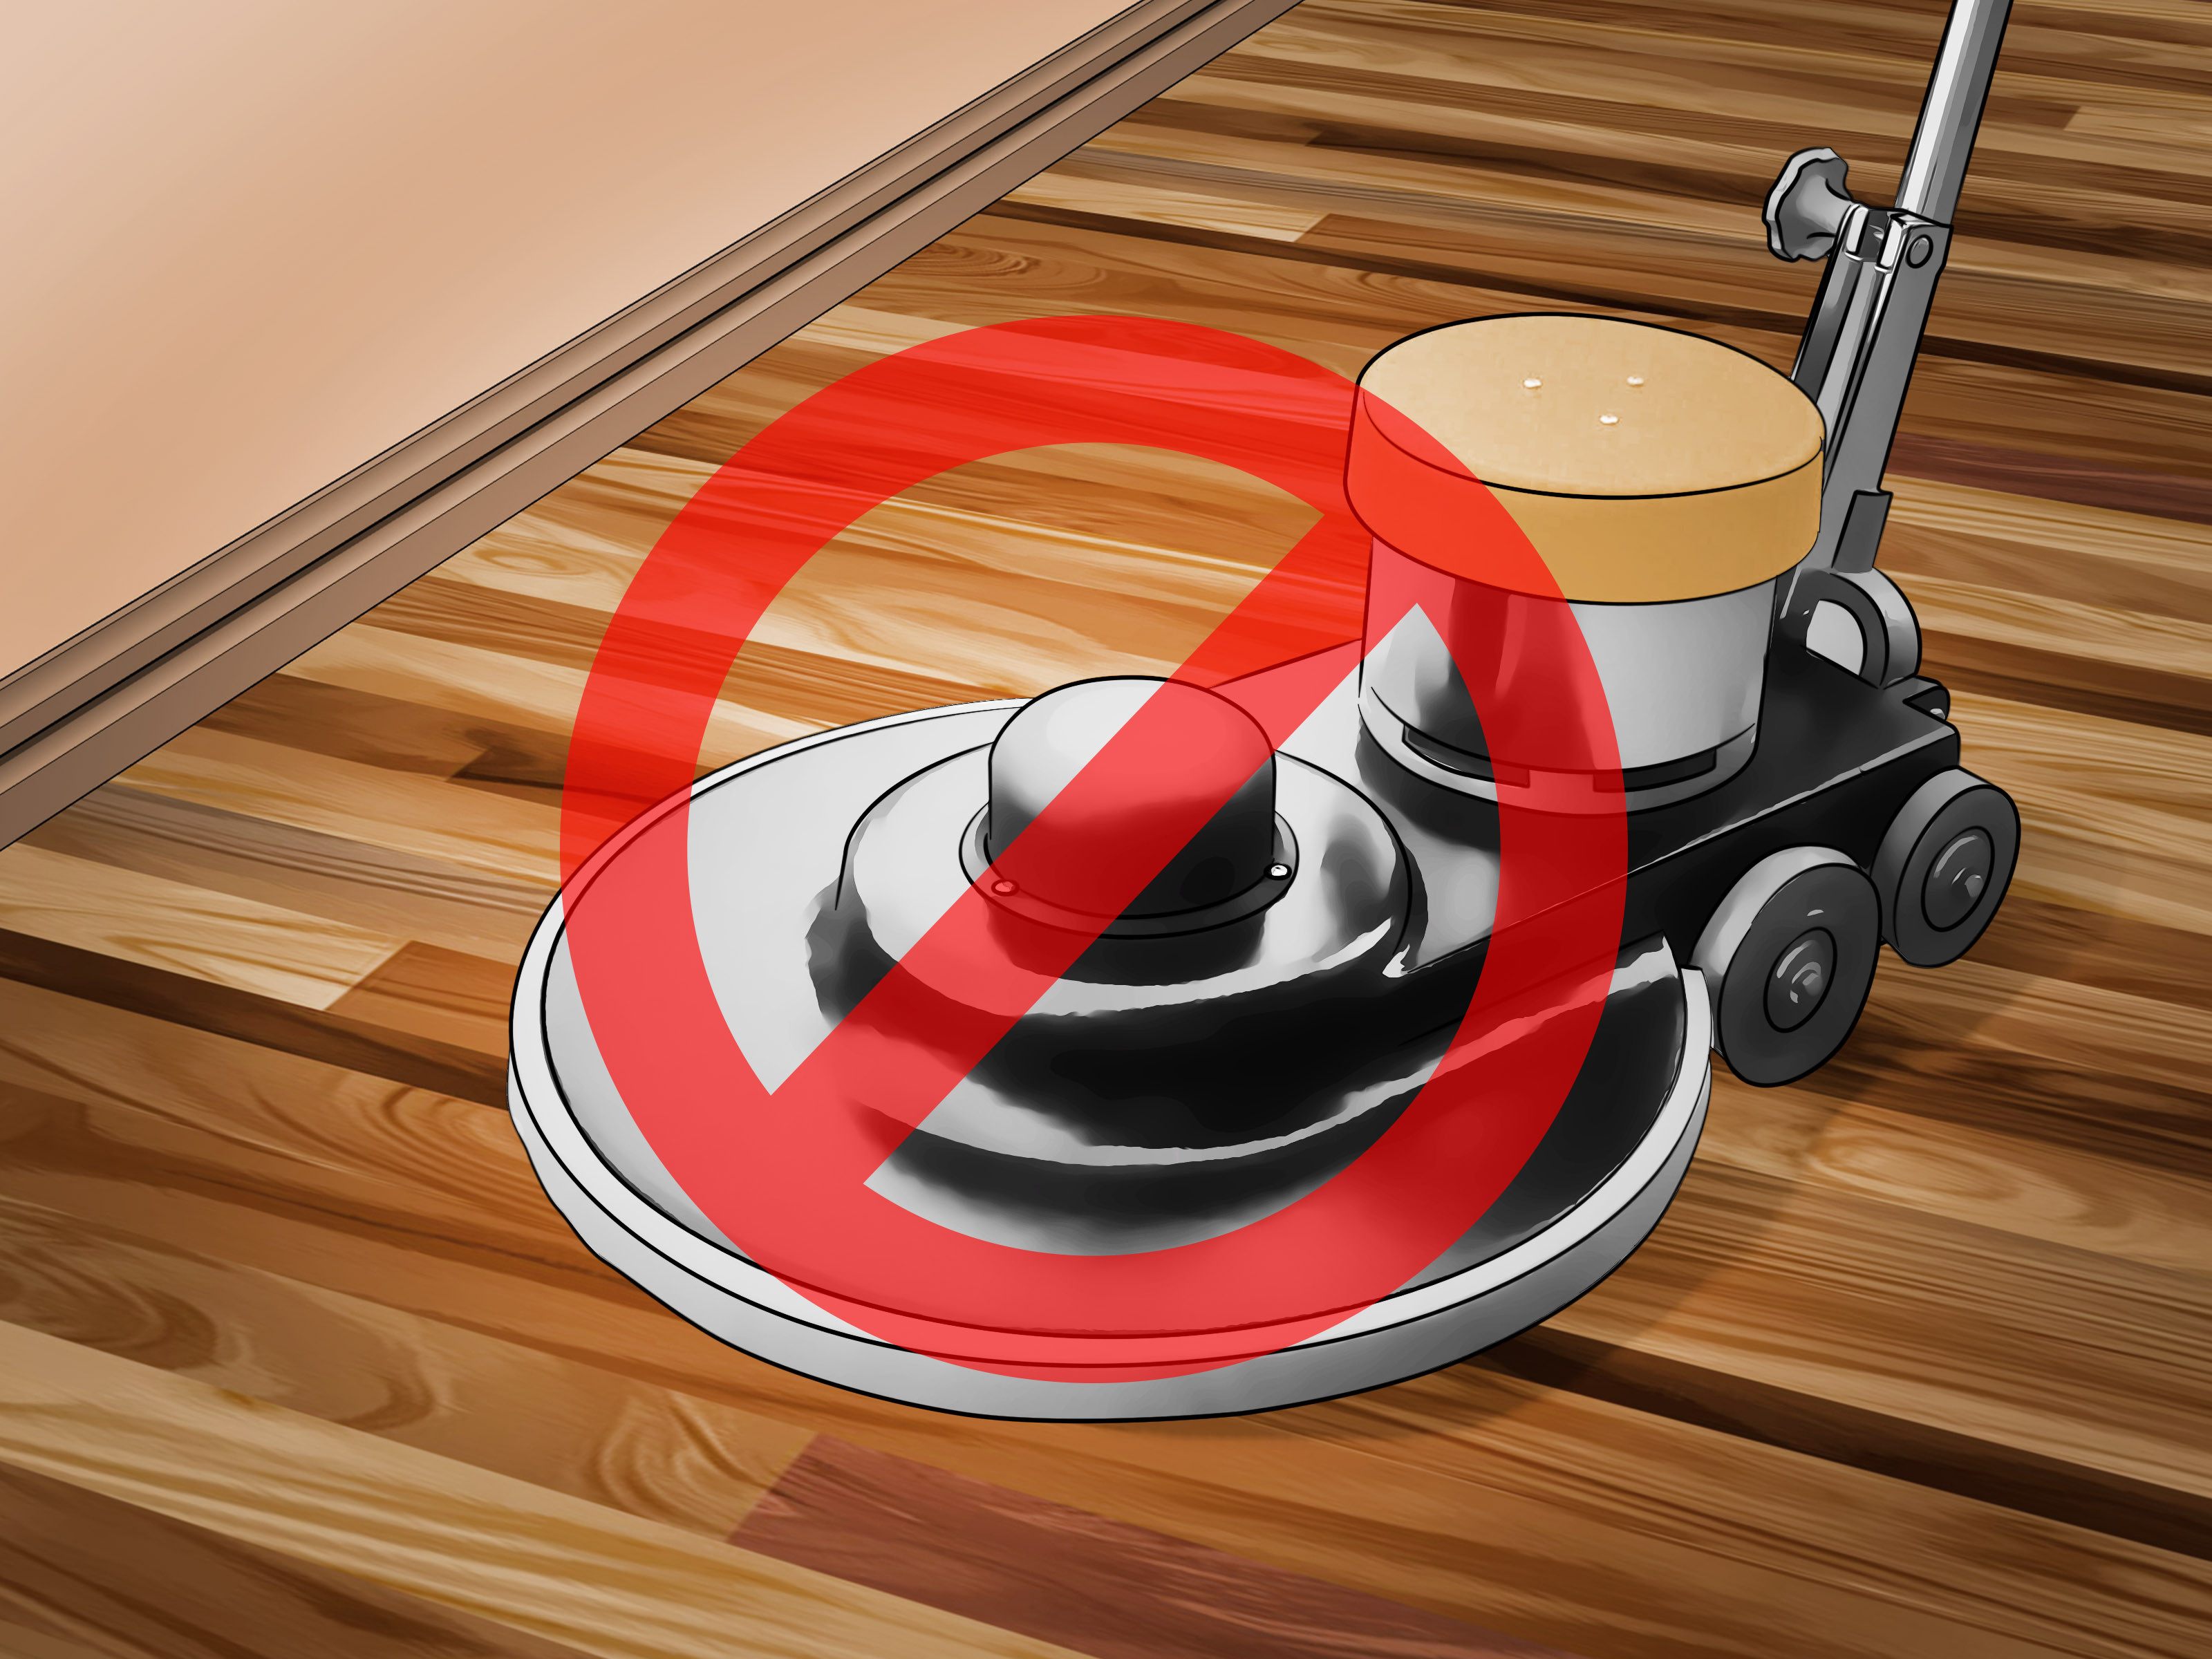 hardwood floor vacuum brush of 4 ways to clean polyurethane wood floors wikihow for clean polyurethane wood floors step 15